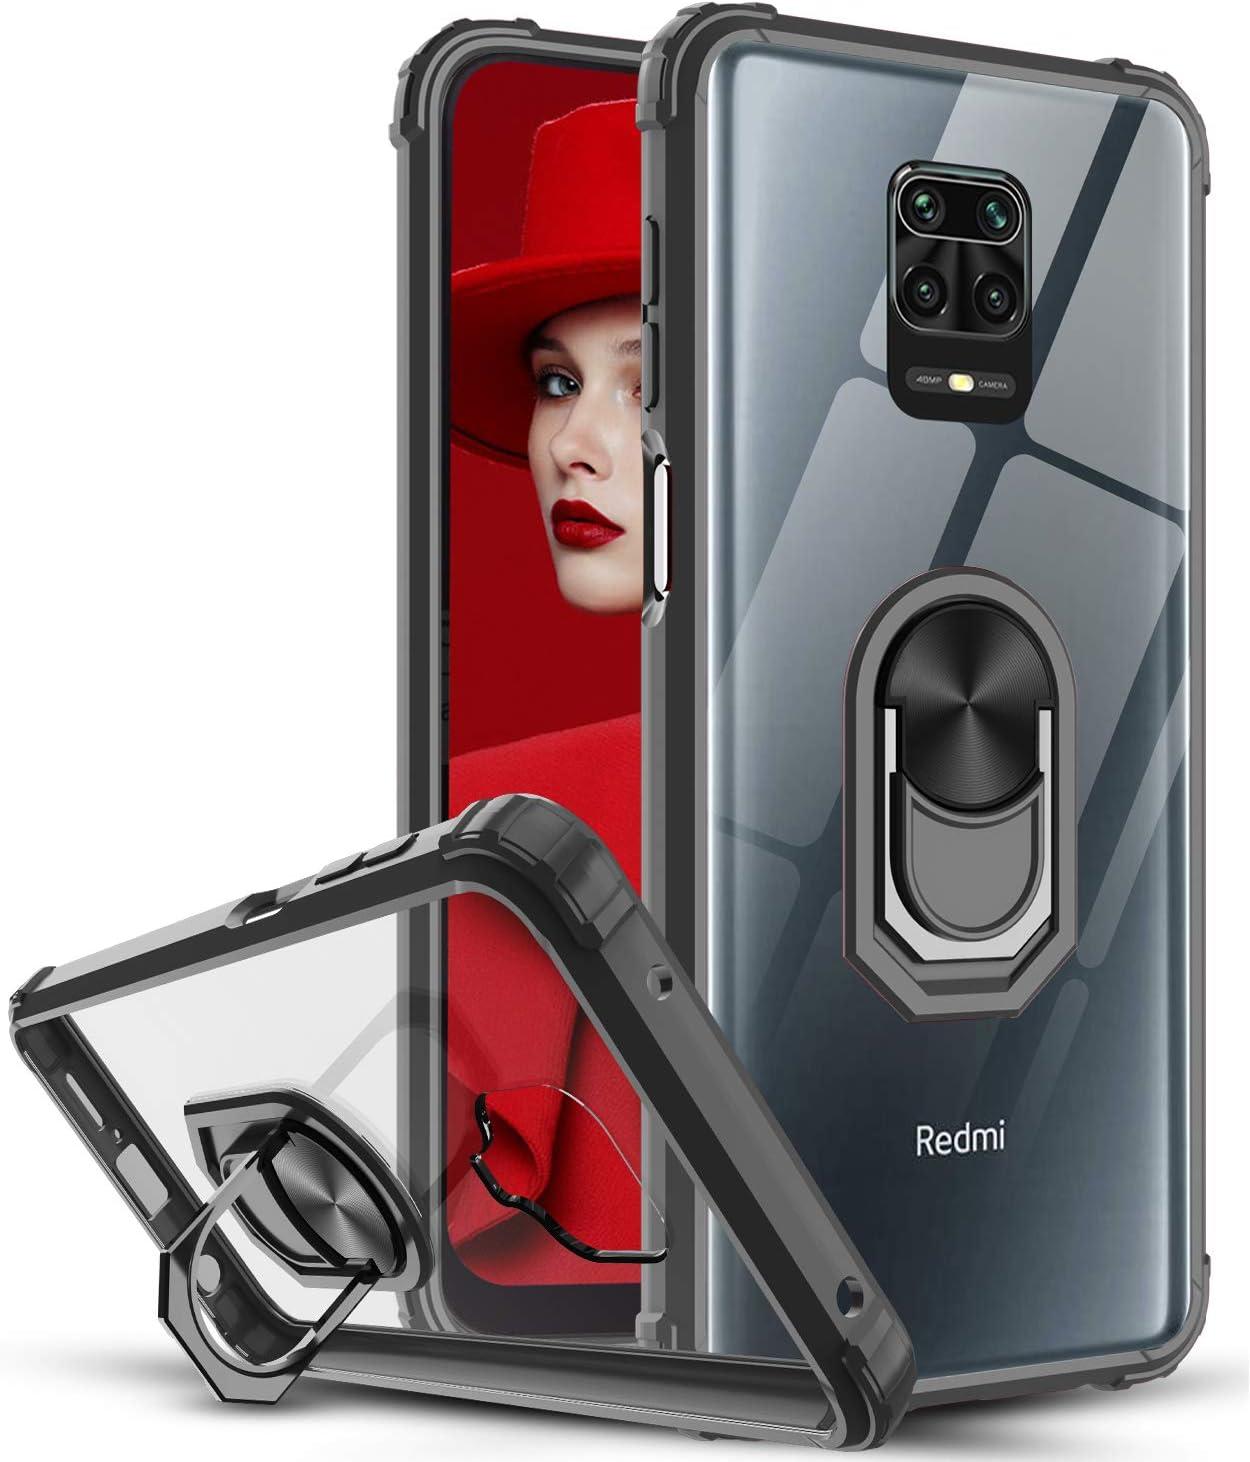 LeYi Funda Xiaomi Redmi Note 9s / Note 9 Pro,Transparente Carcasa con 360 Grados iman Soporte Silicona Bumper Armor Case para Movil Note 9s,Clear Negro